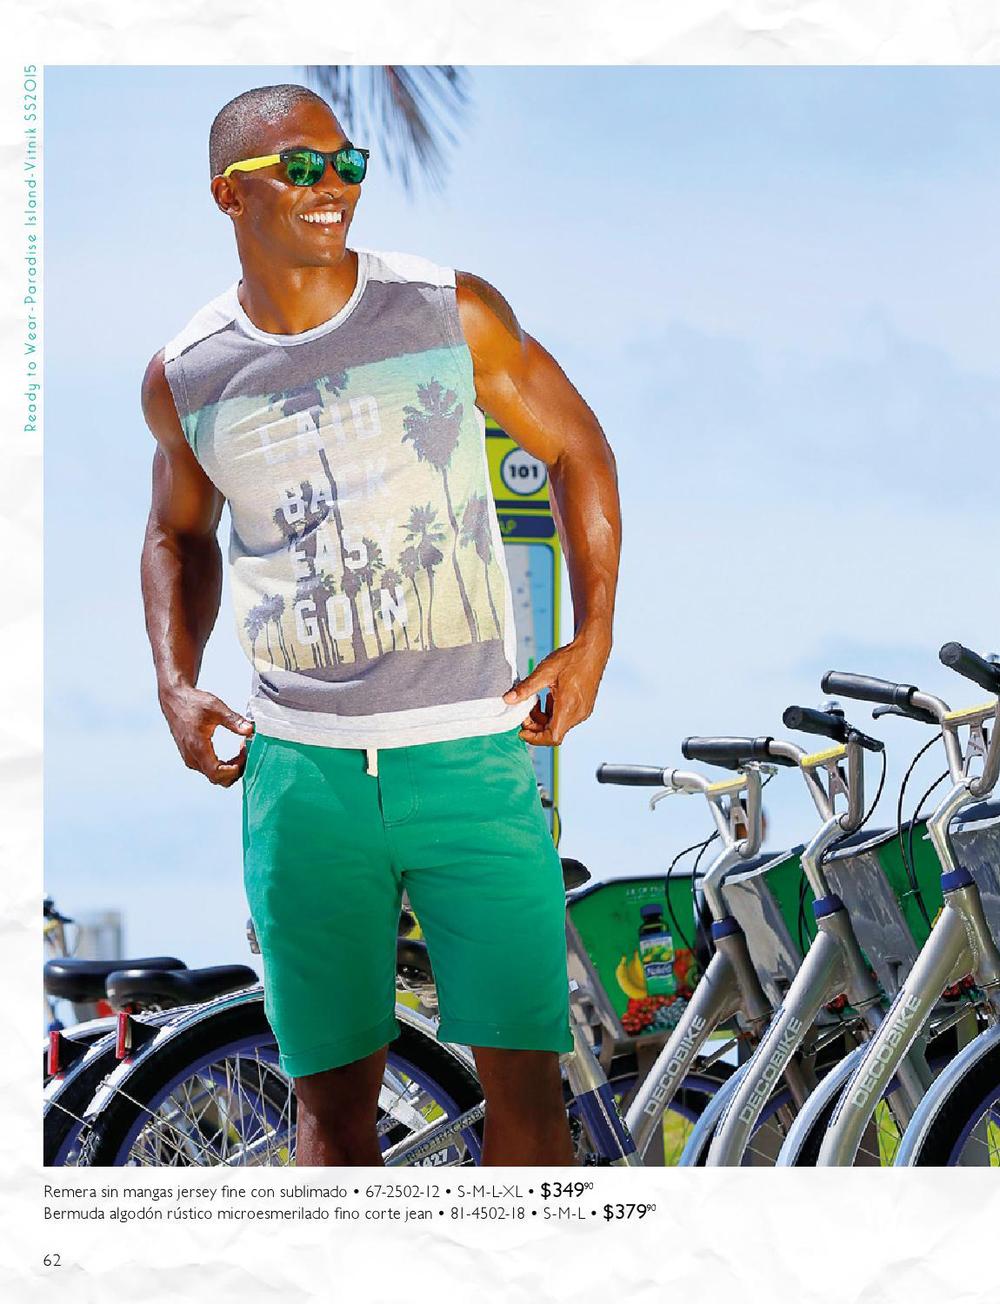 bikes-beach-vitnik-aygemang.jpg